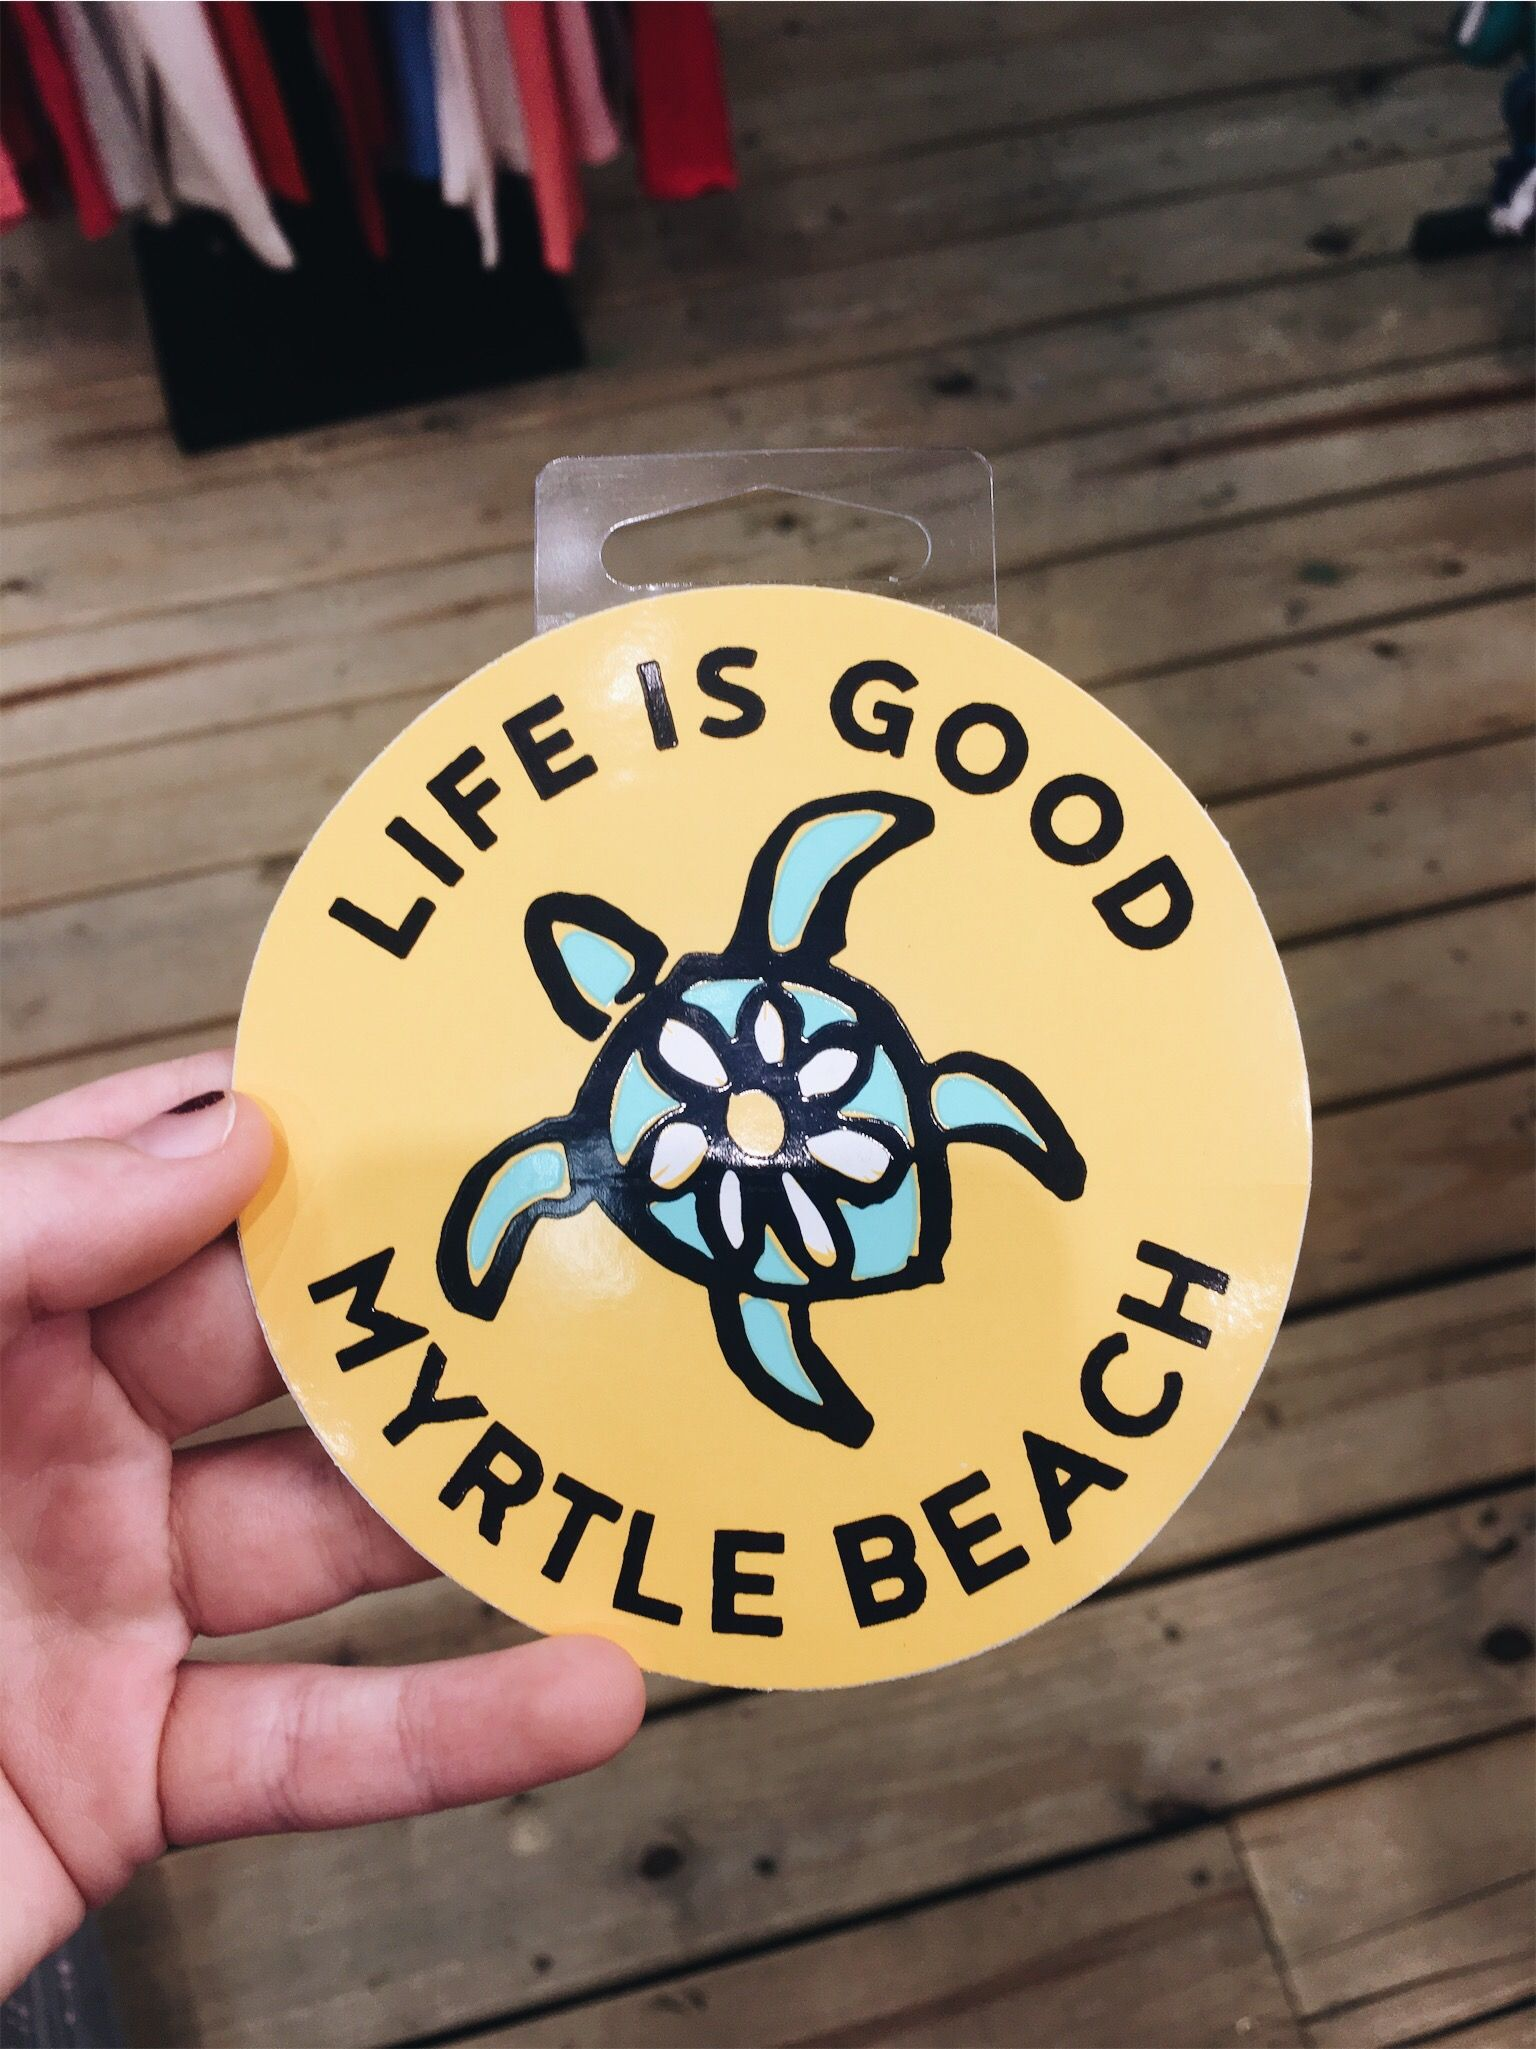 Myrtle Beach Sticker Aesthetic Stickers Laptop Stickers Cute